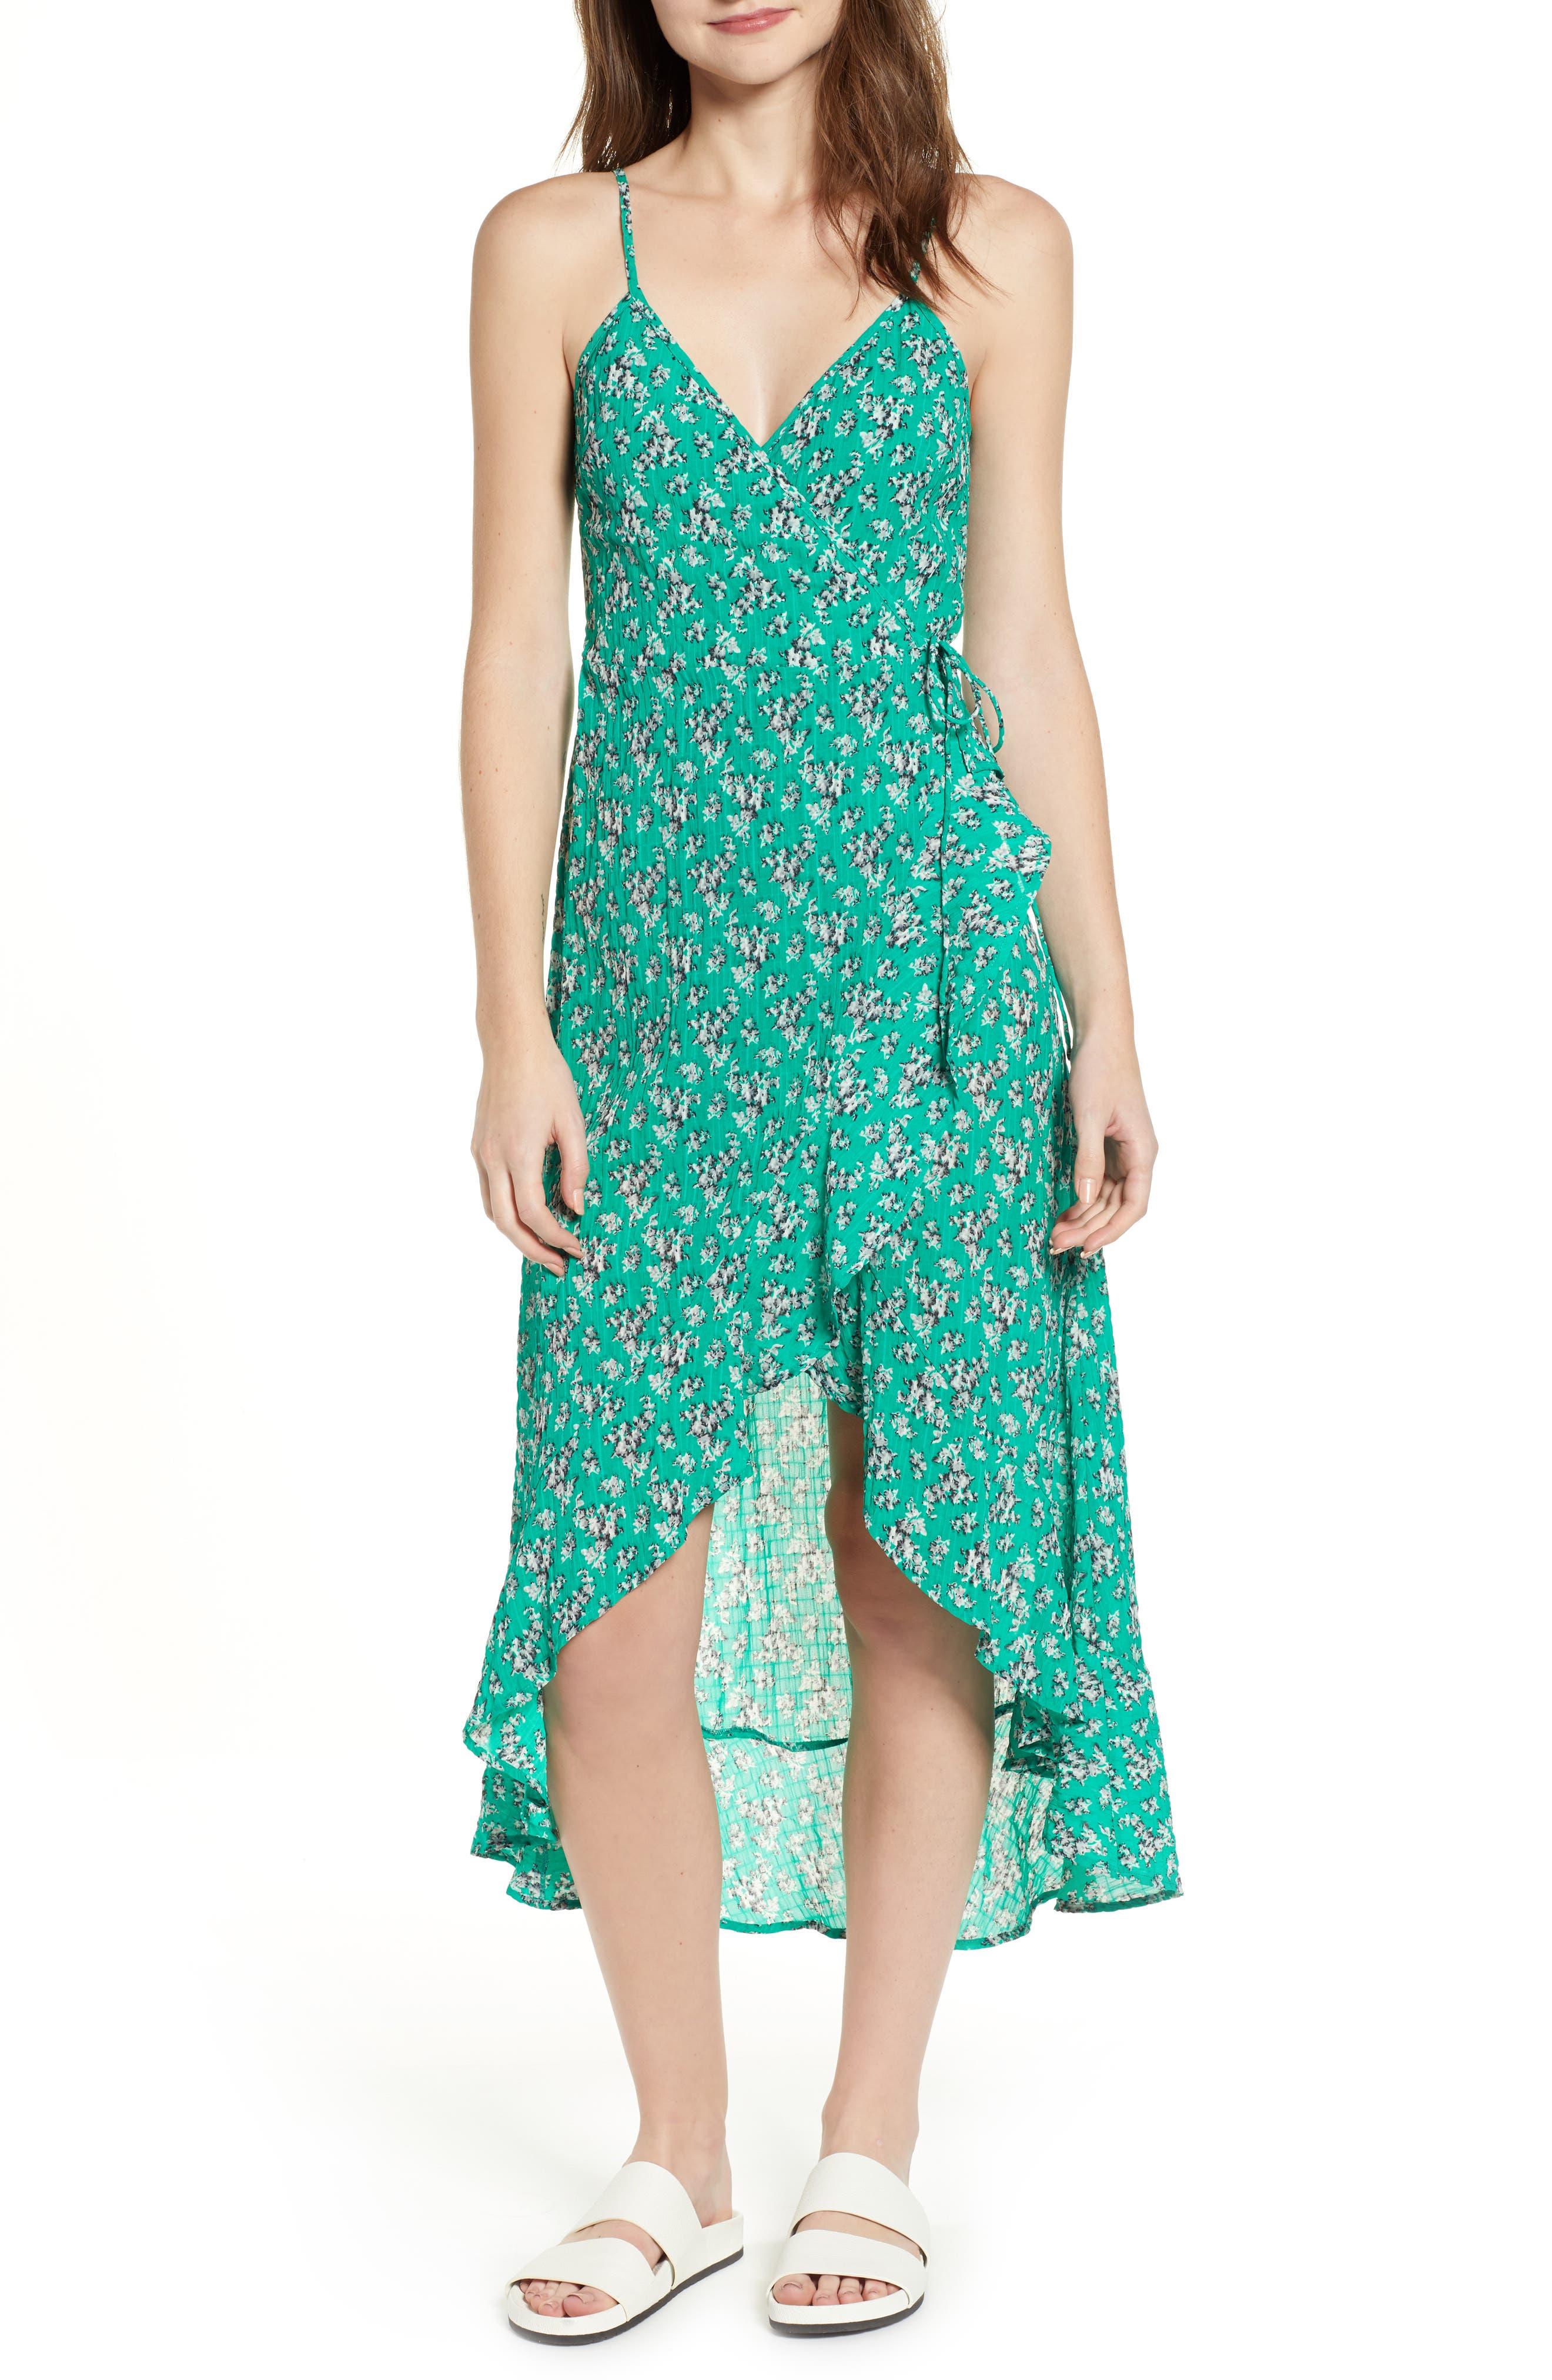 Adventurer Floral Print High/Low Dress,                             Main thumbnail 1, color,                             GREEN FLORAL